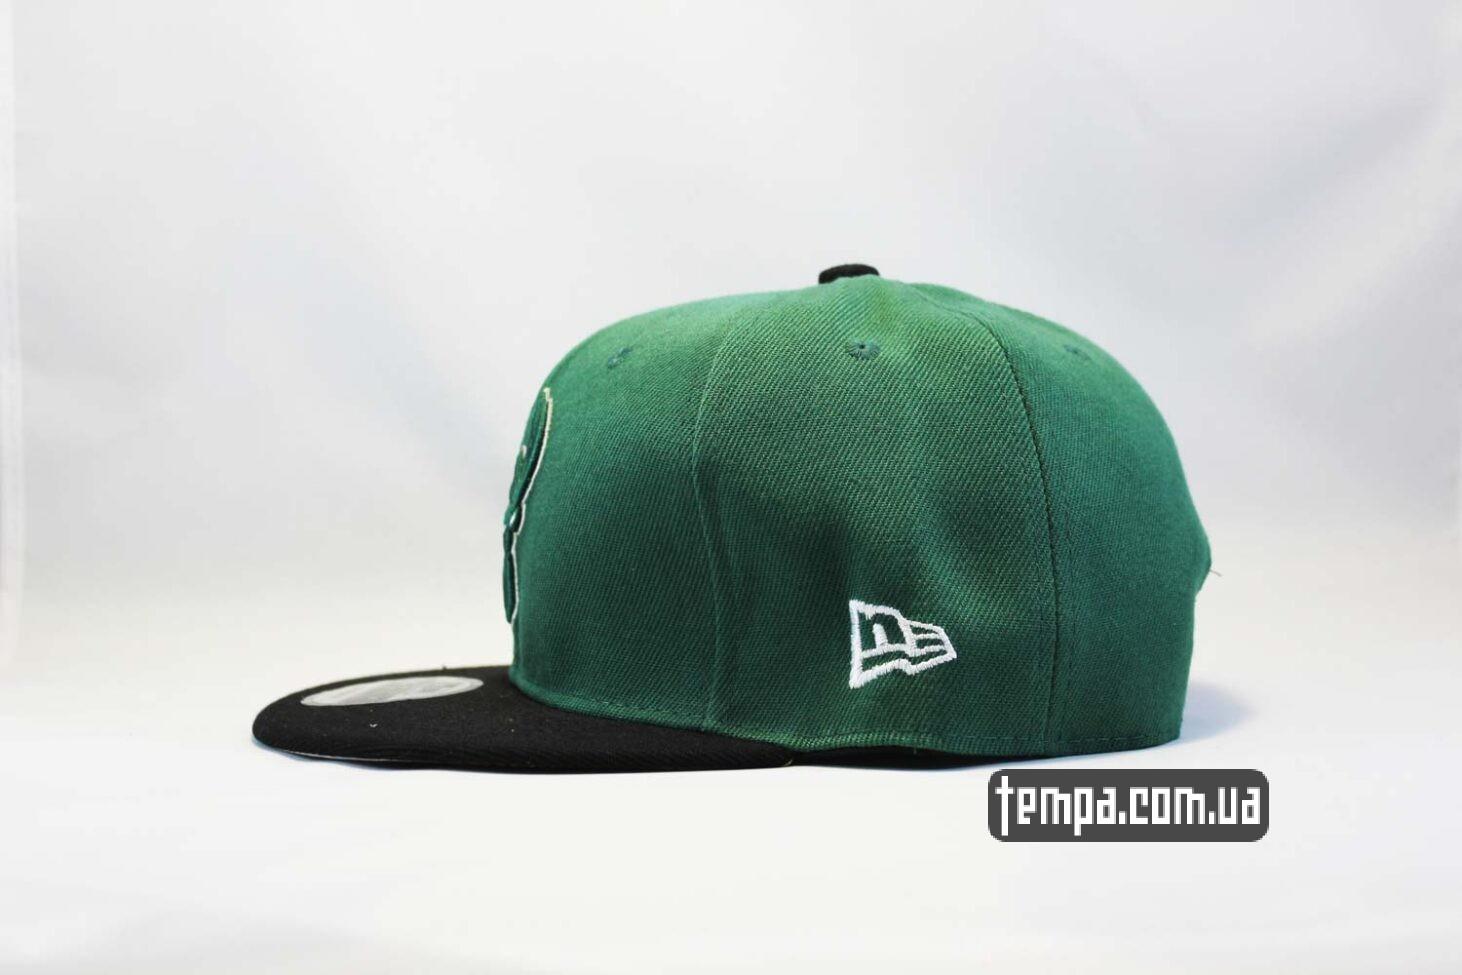 зеленая бейсболка Snapback Boston Baseball с оленем New Era 9fifty бейсболка